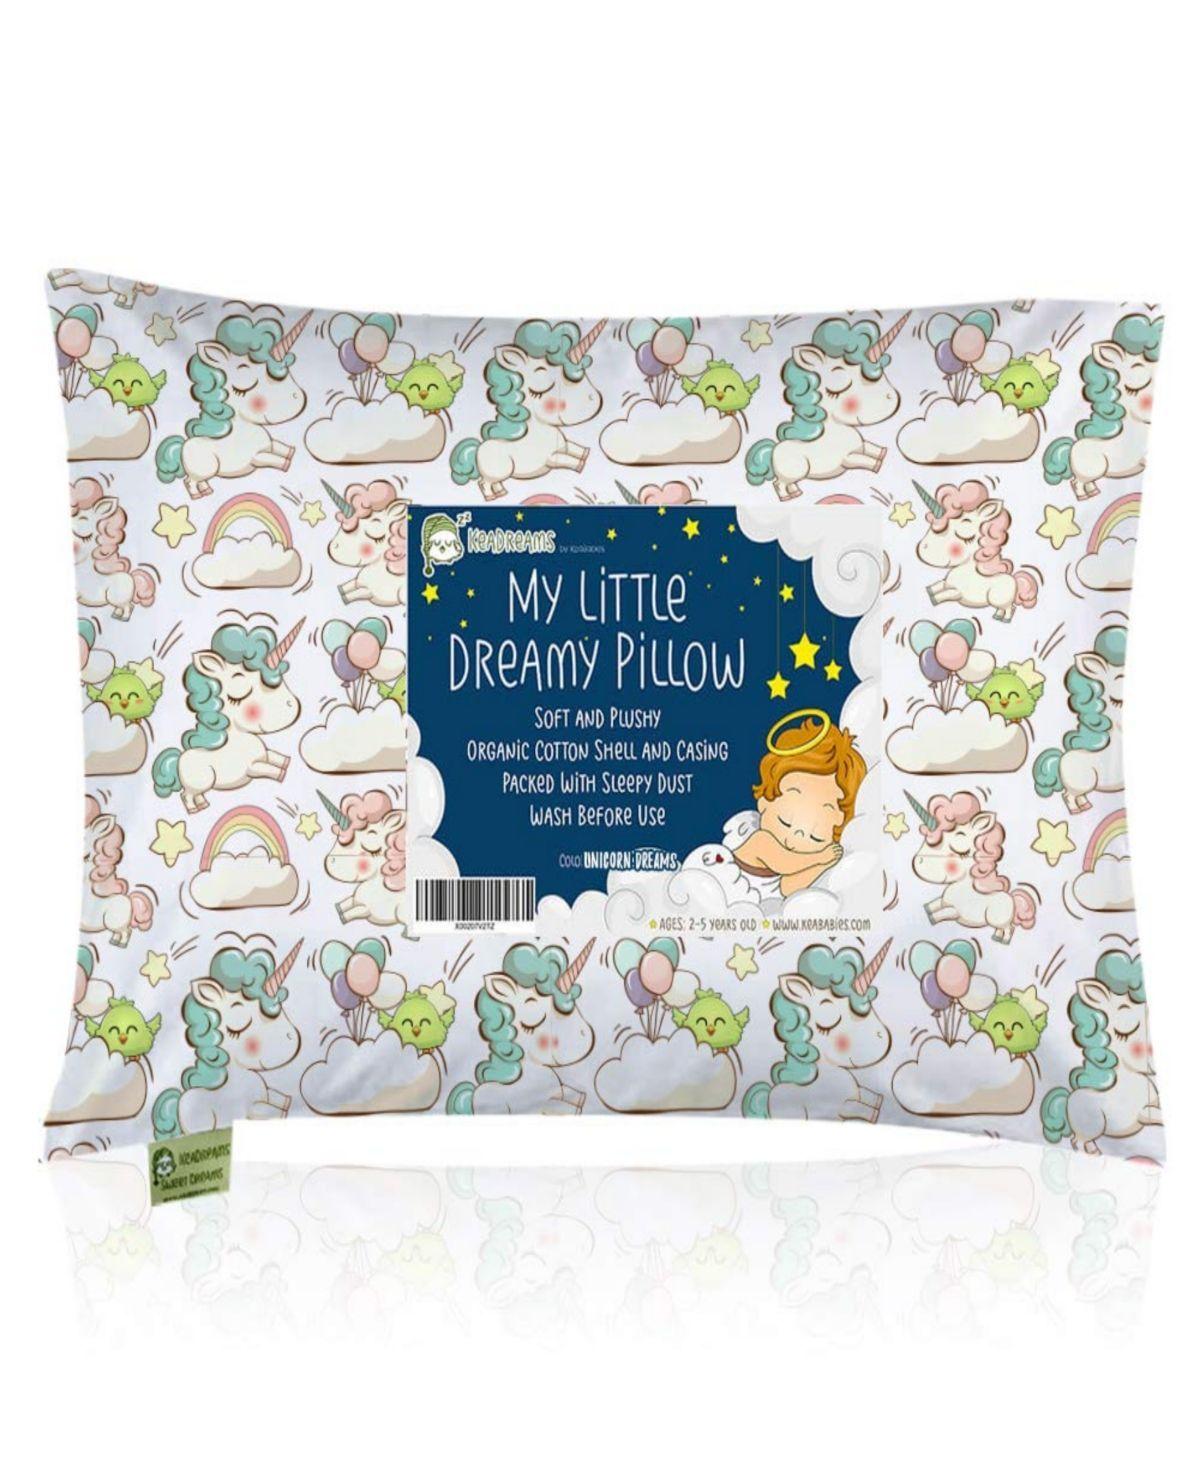 Toddler Pillow With Pillowcase Toddler Pillow Toddler Cot Organic Cotton Baby